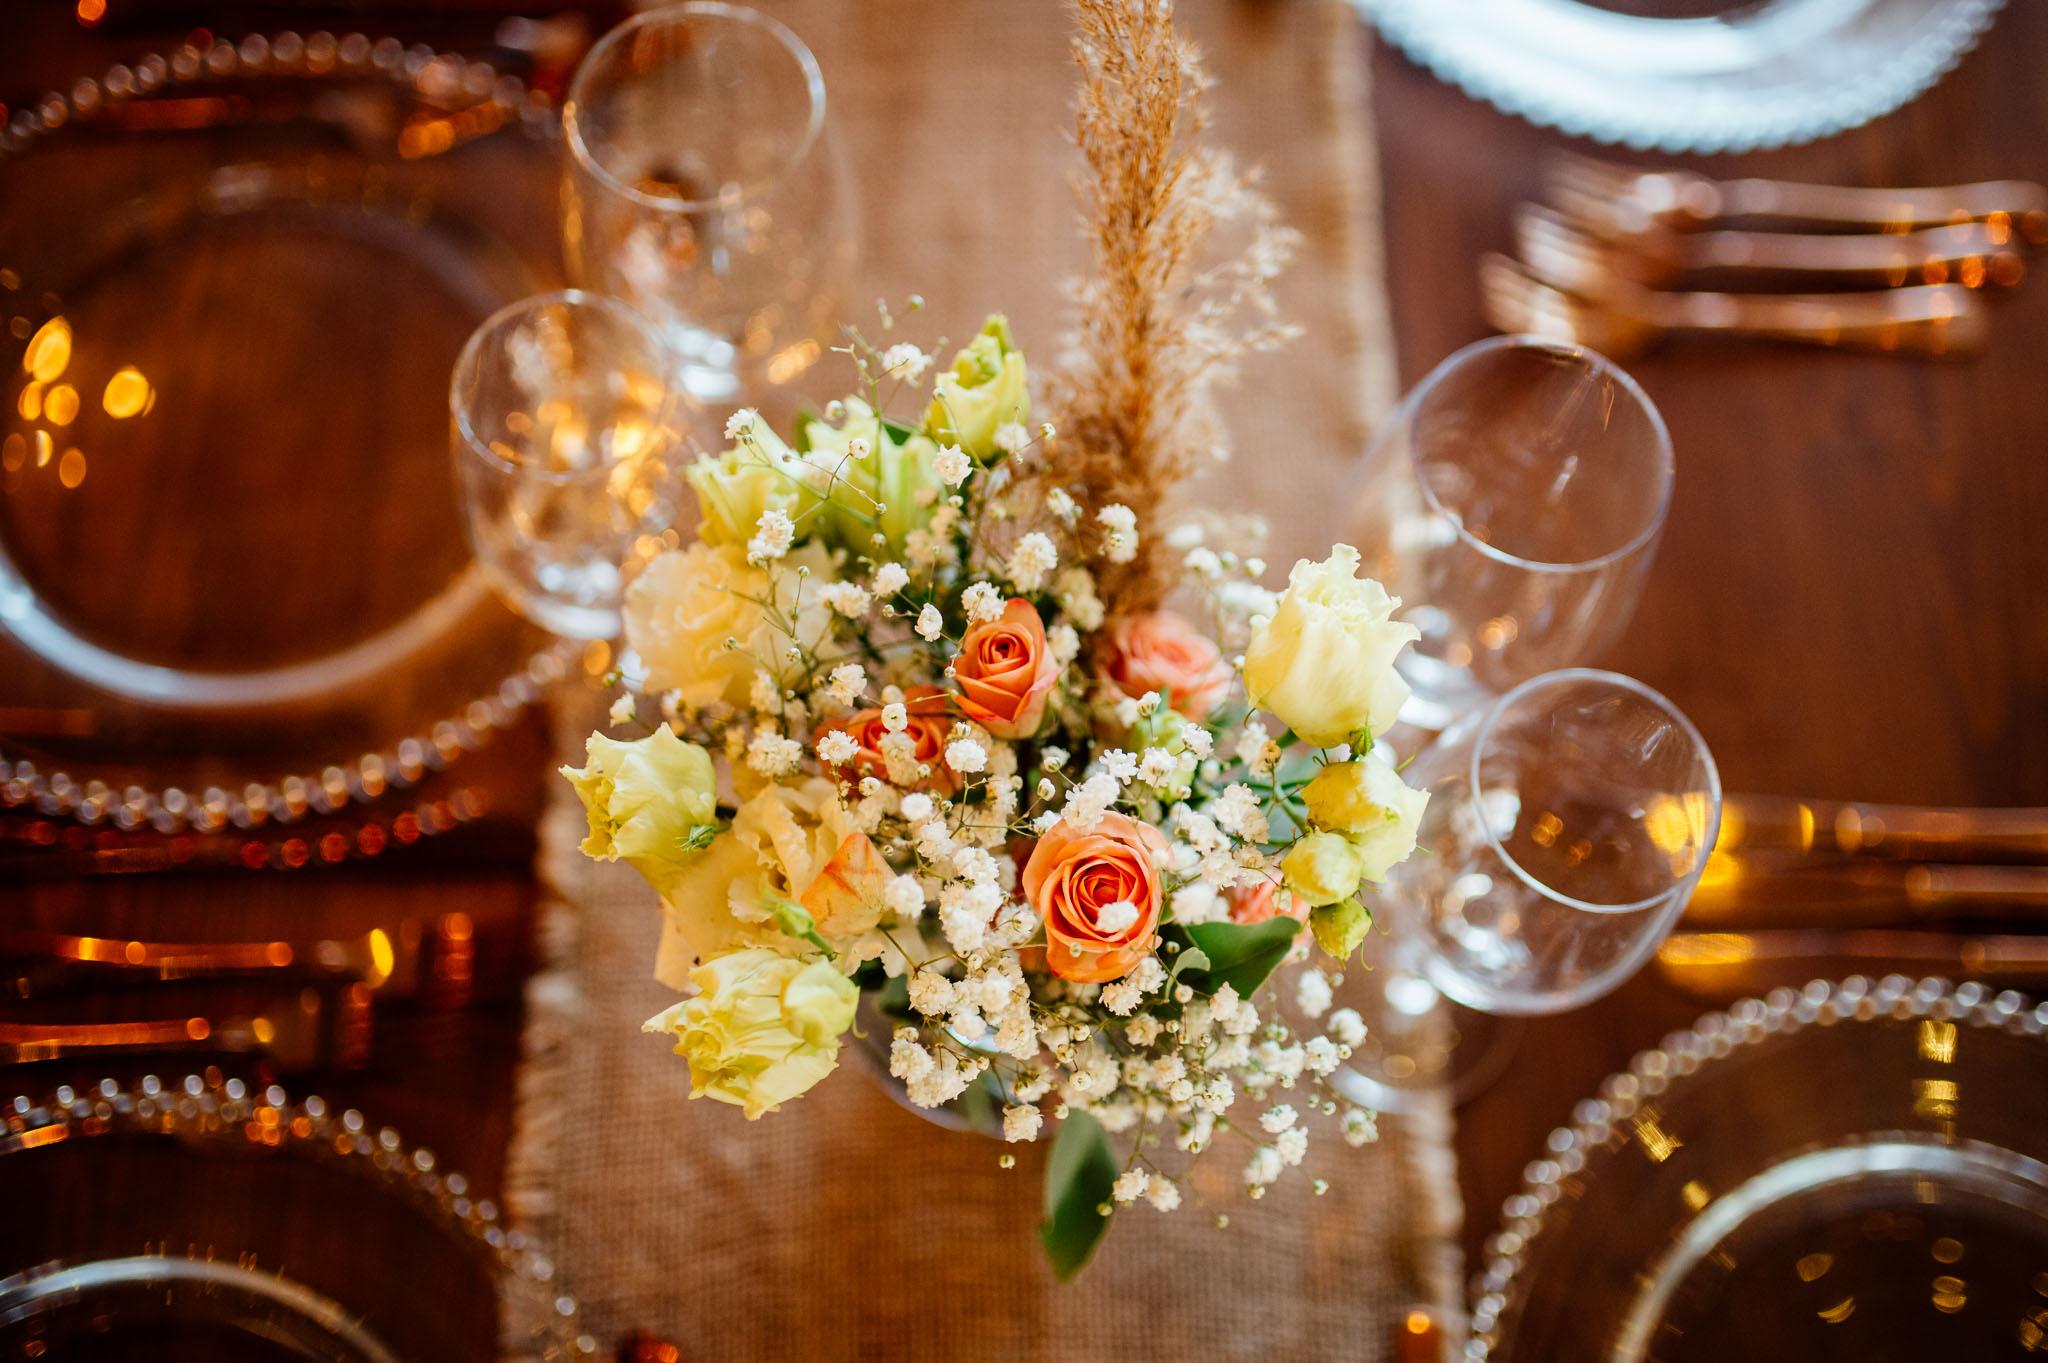 Fotografie documentara de nunta fotograf profesionist Dana Sacalov. Nunta cu accente rustice la The Greenspot Wedding Barn